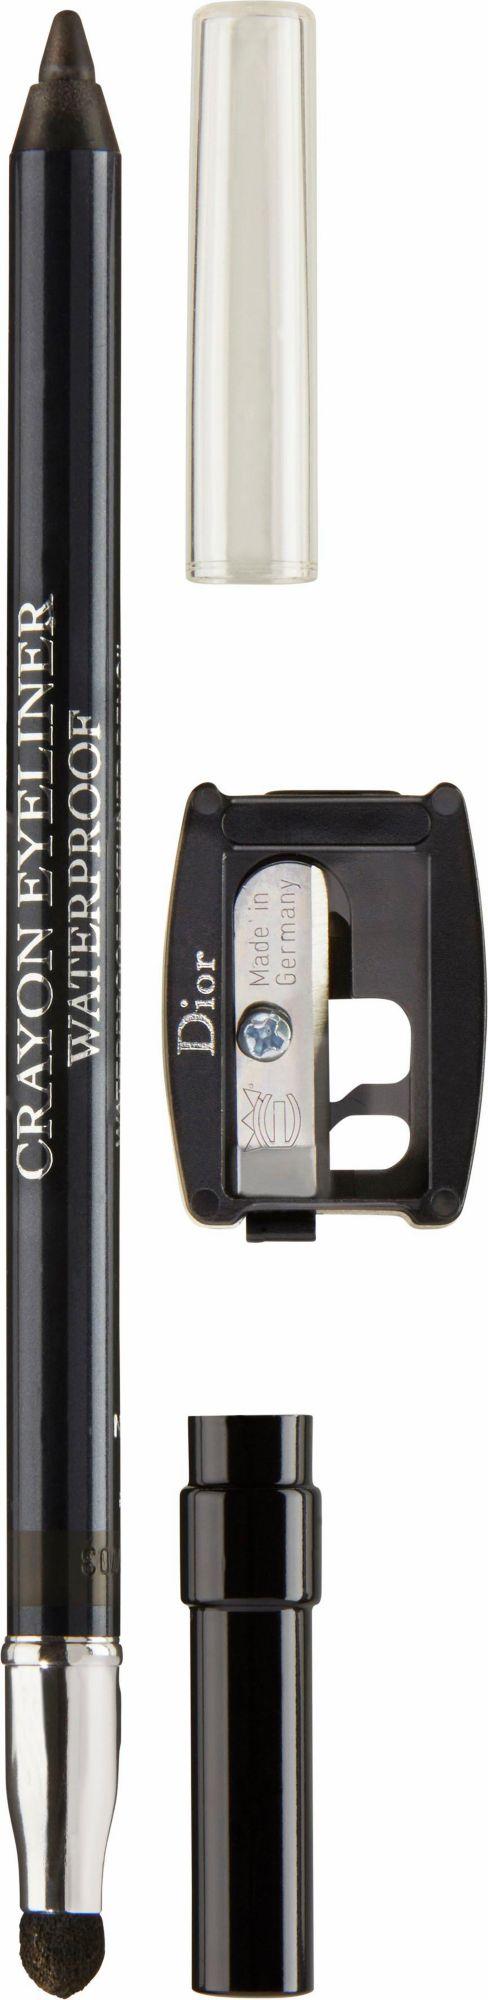 DIOR Dior, »Crayon Eyeliner Waterproof«, Eyeliner